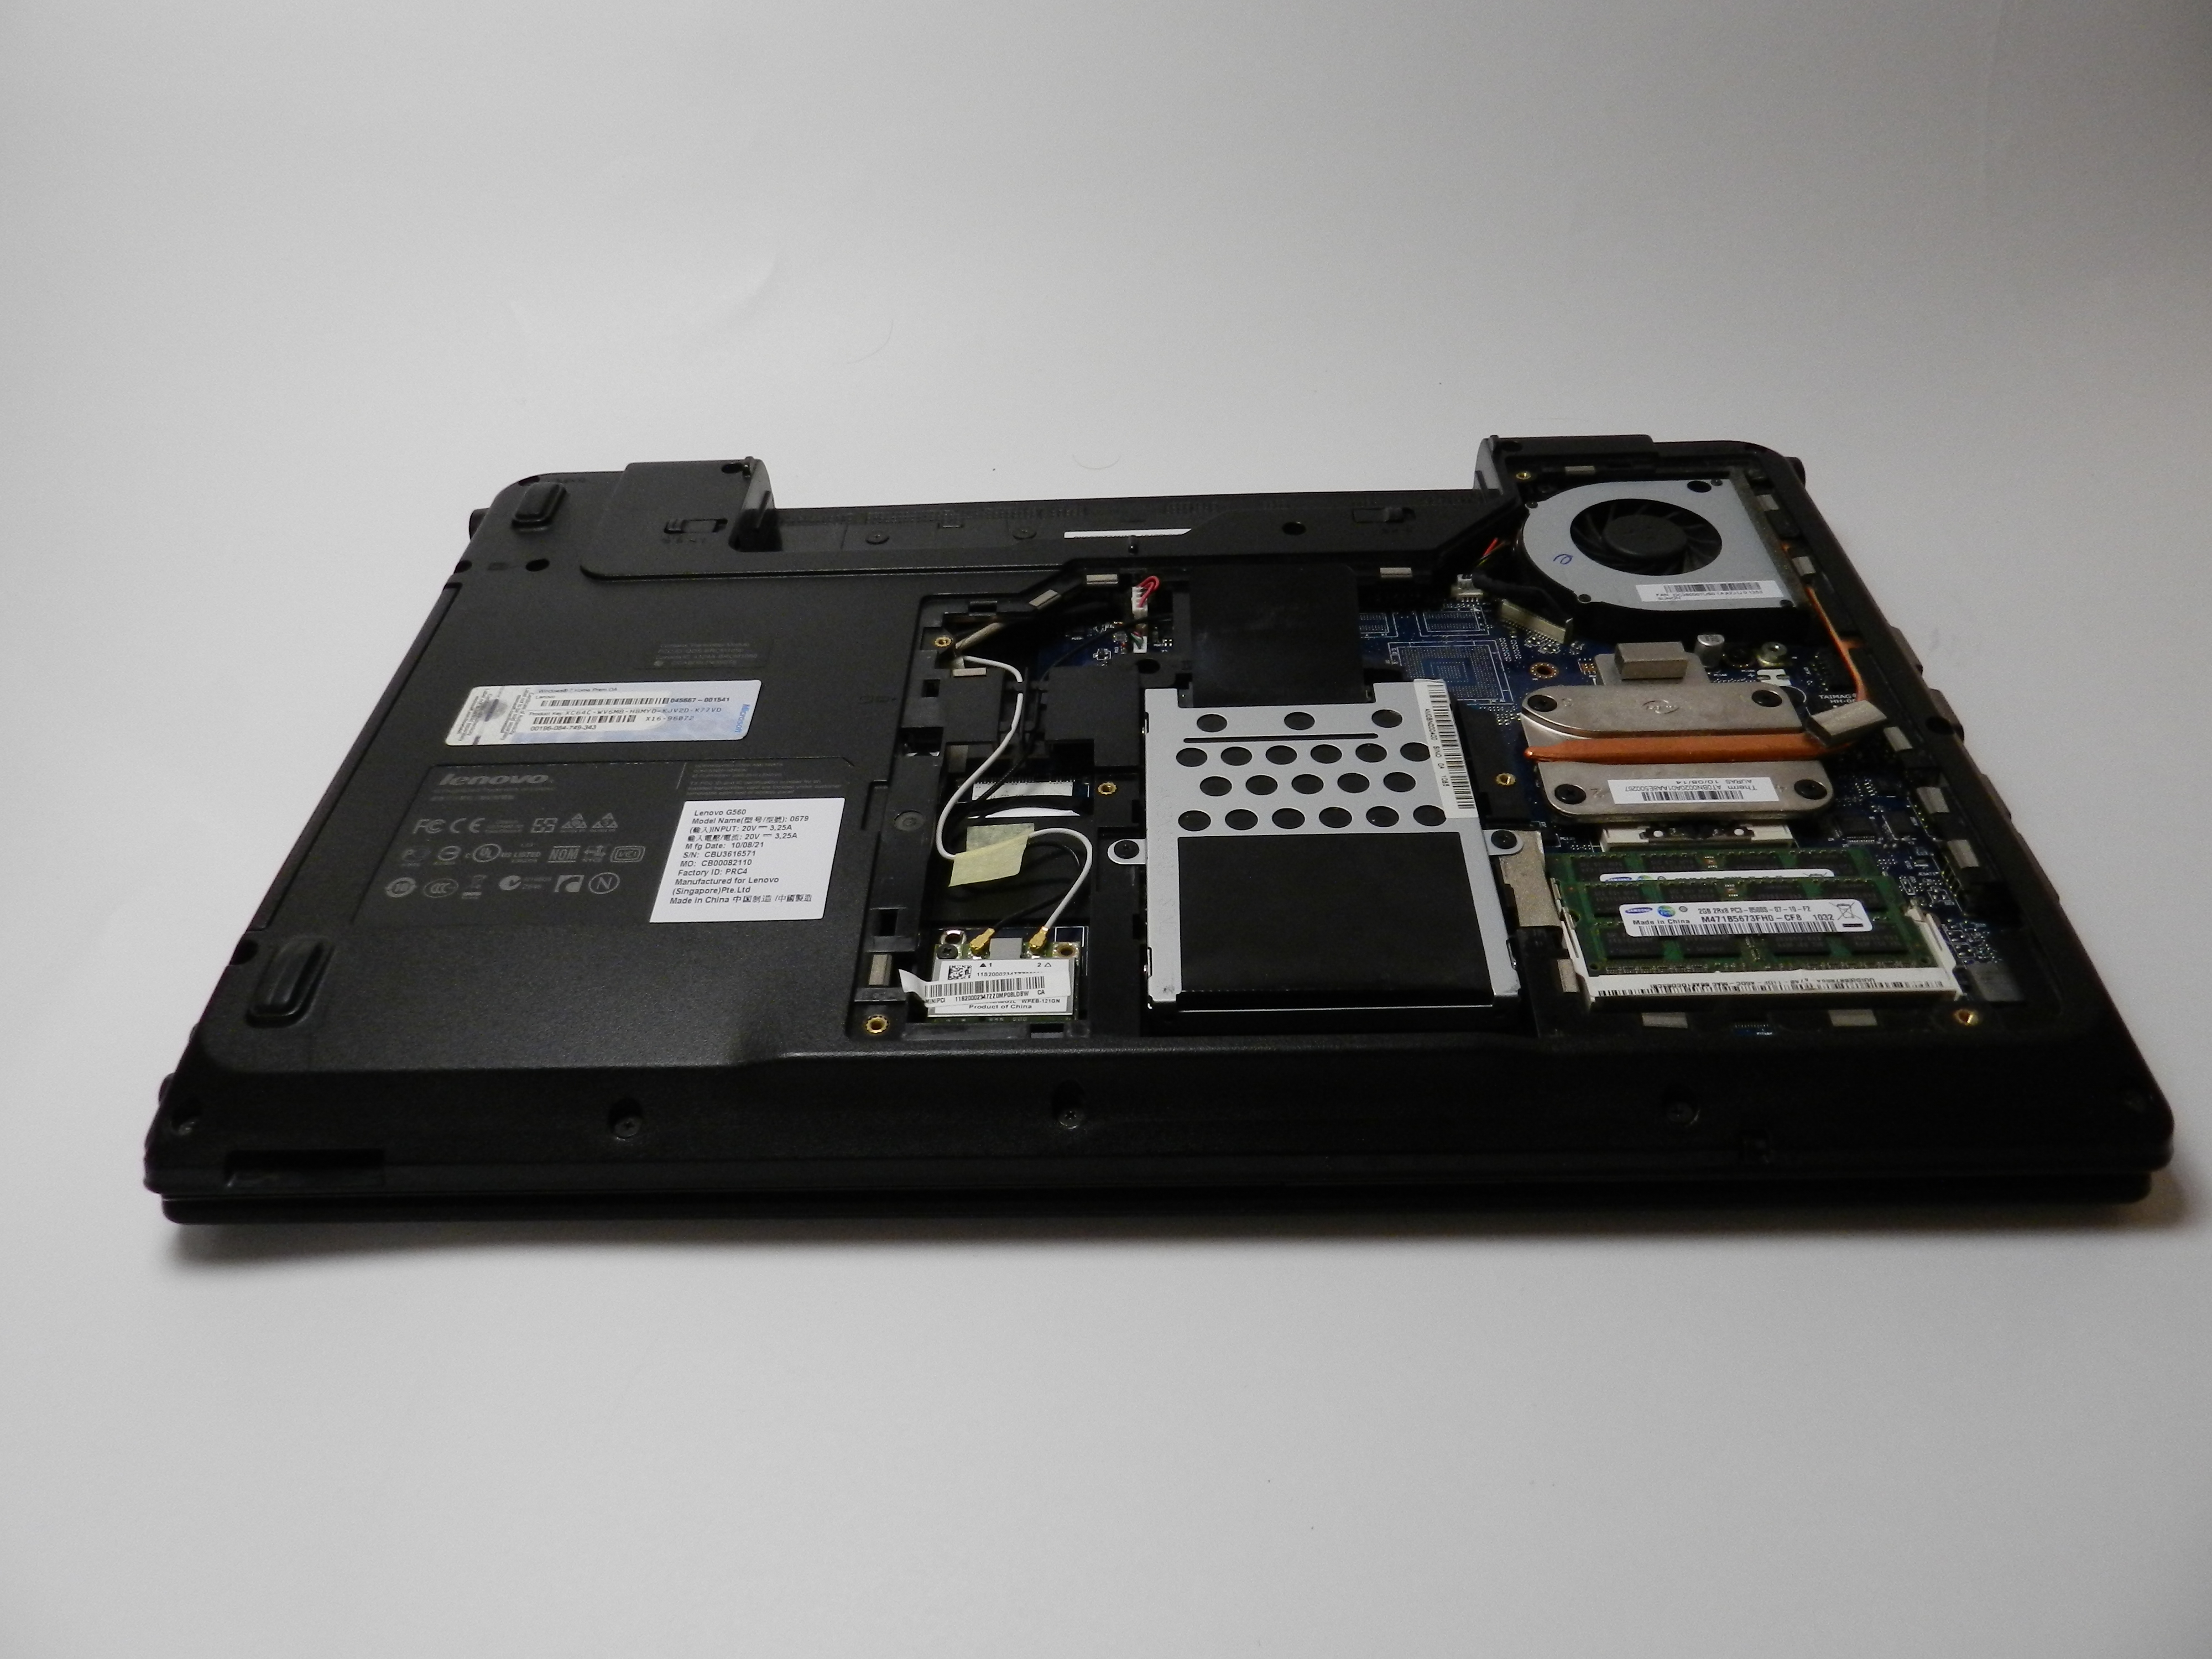 Western Digital Hard Drive PCB Swap Replacement Guide ...